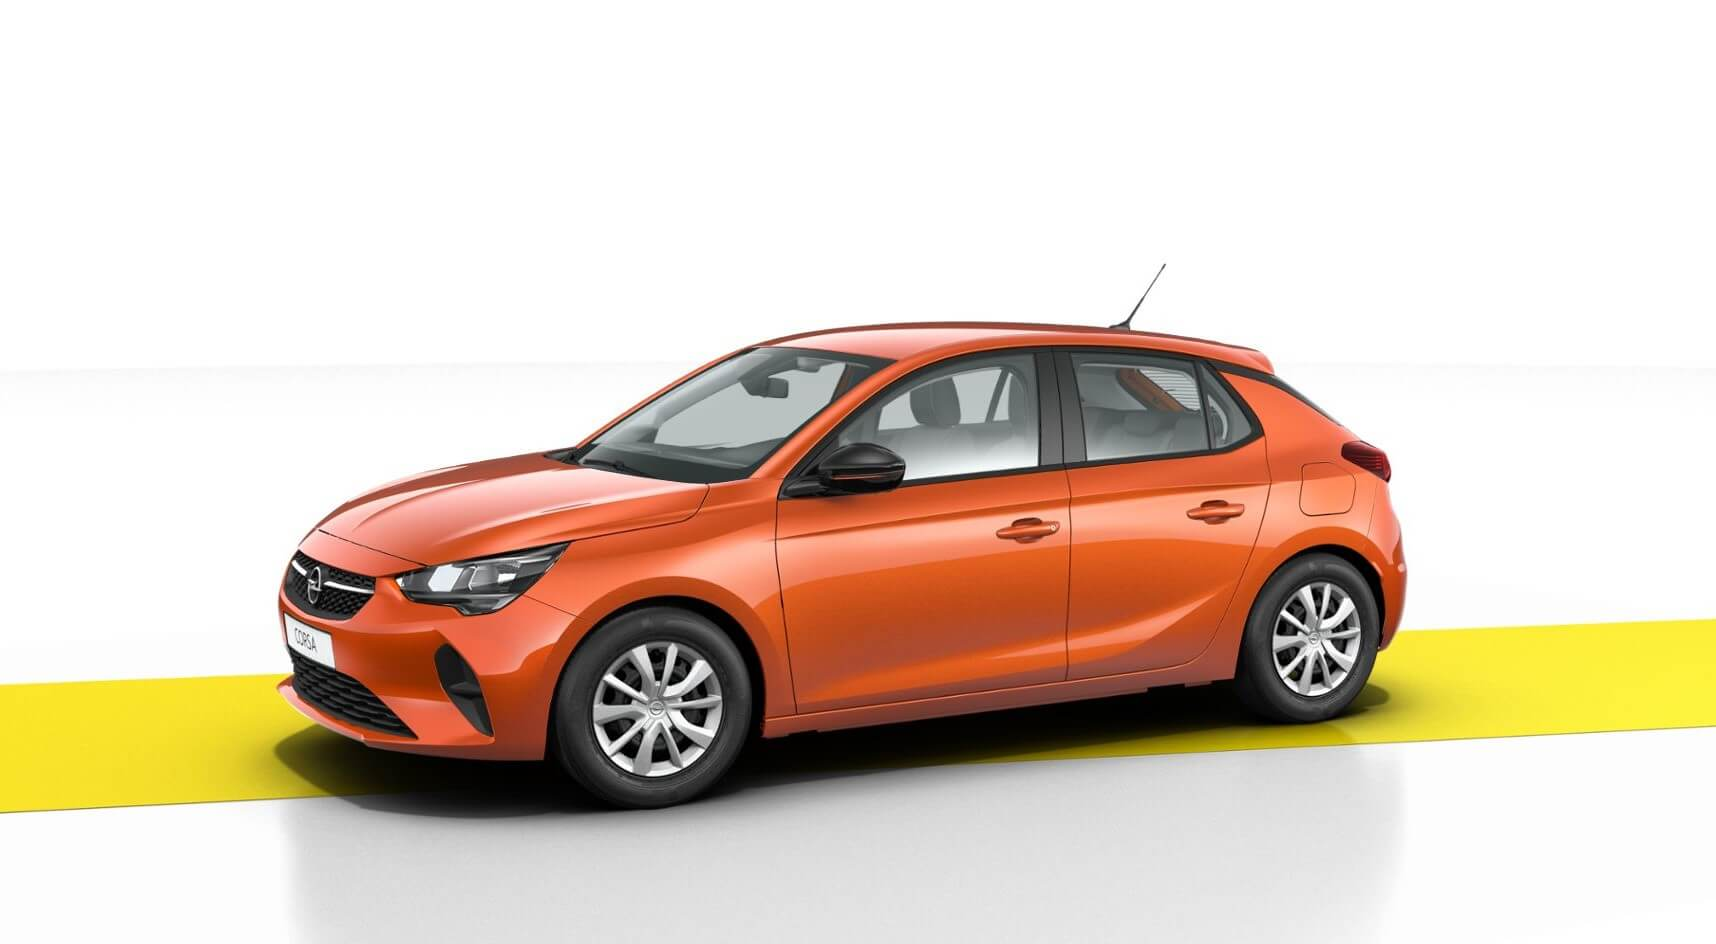 Opel Corsa Edition: frontal.